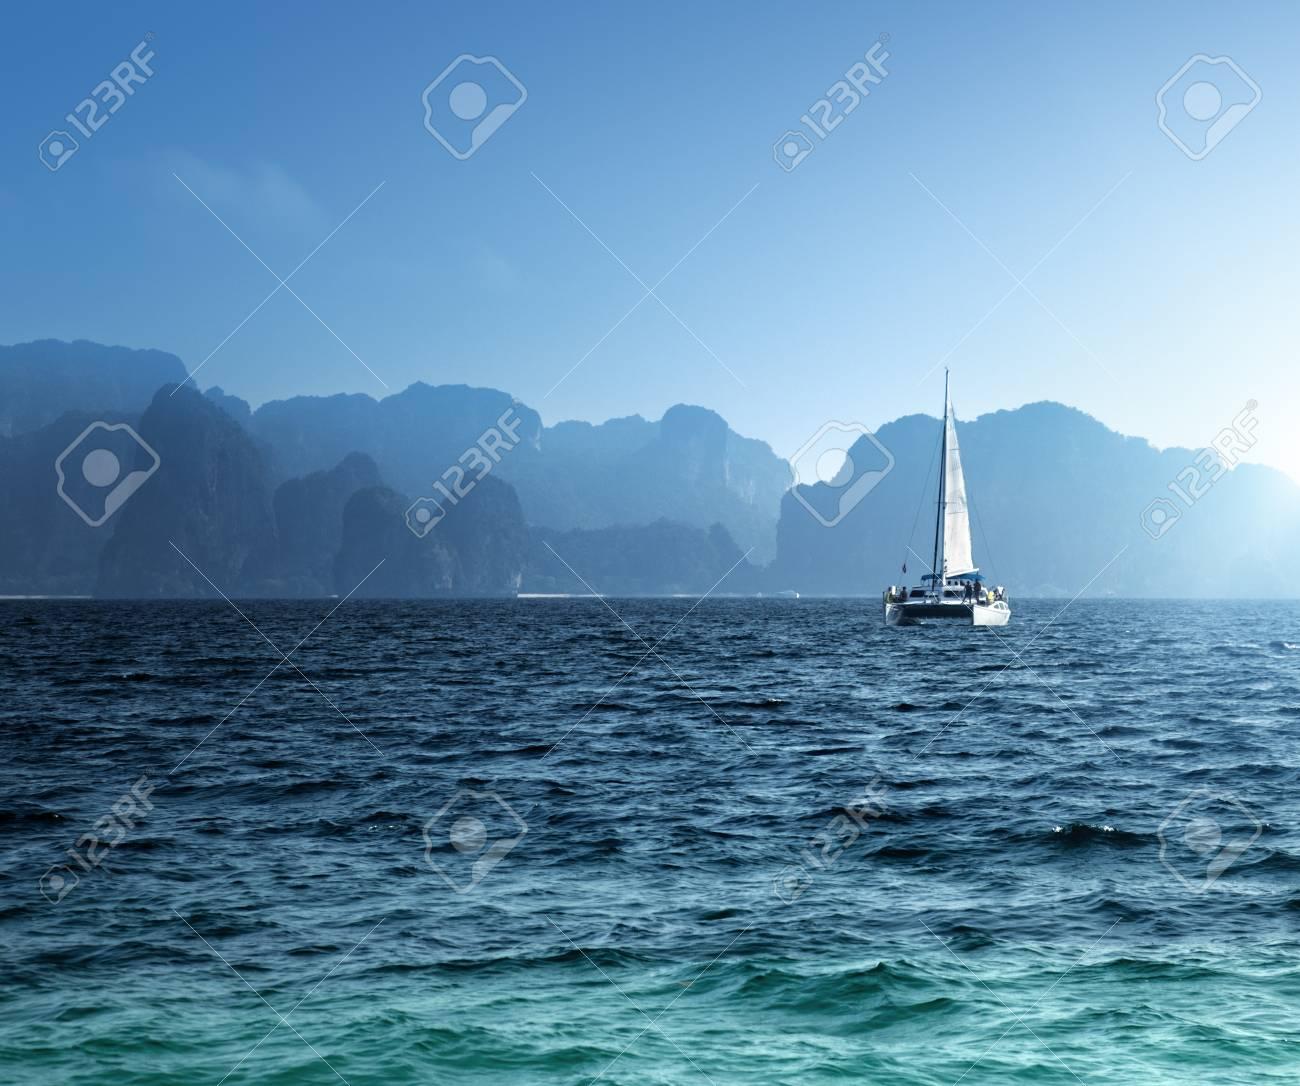 yacht and ocean Krabi province, Thailand Stock Photo - 23486992